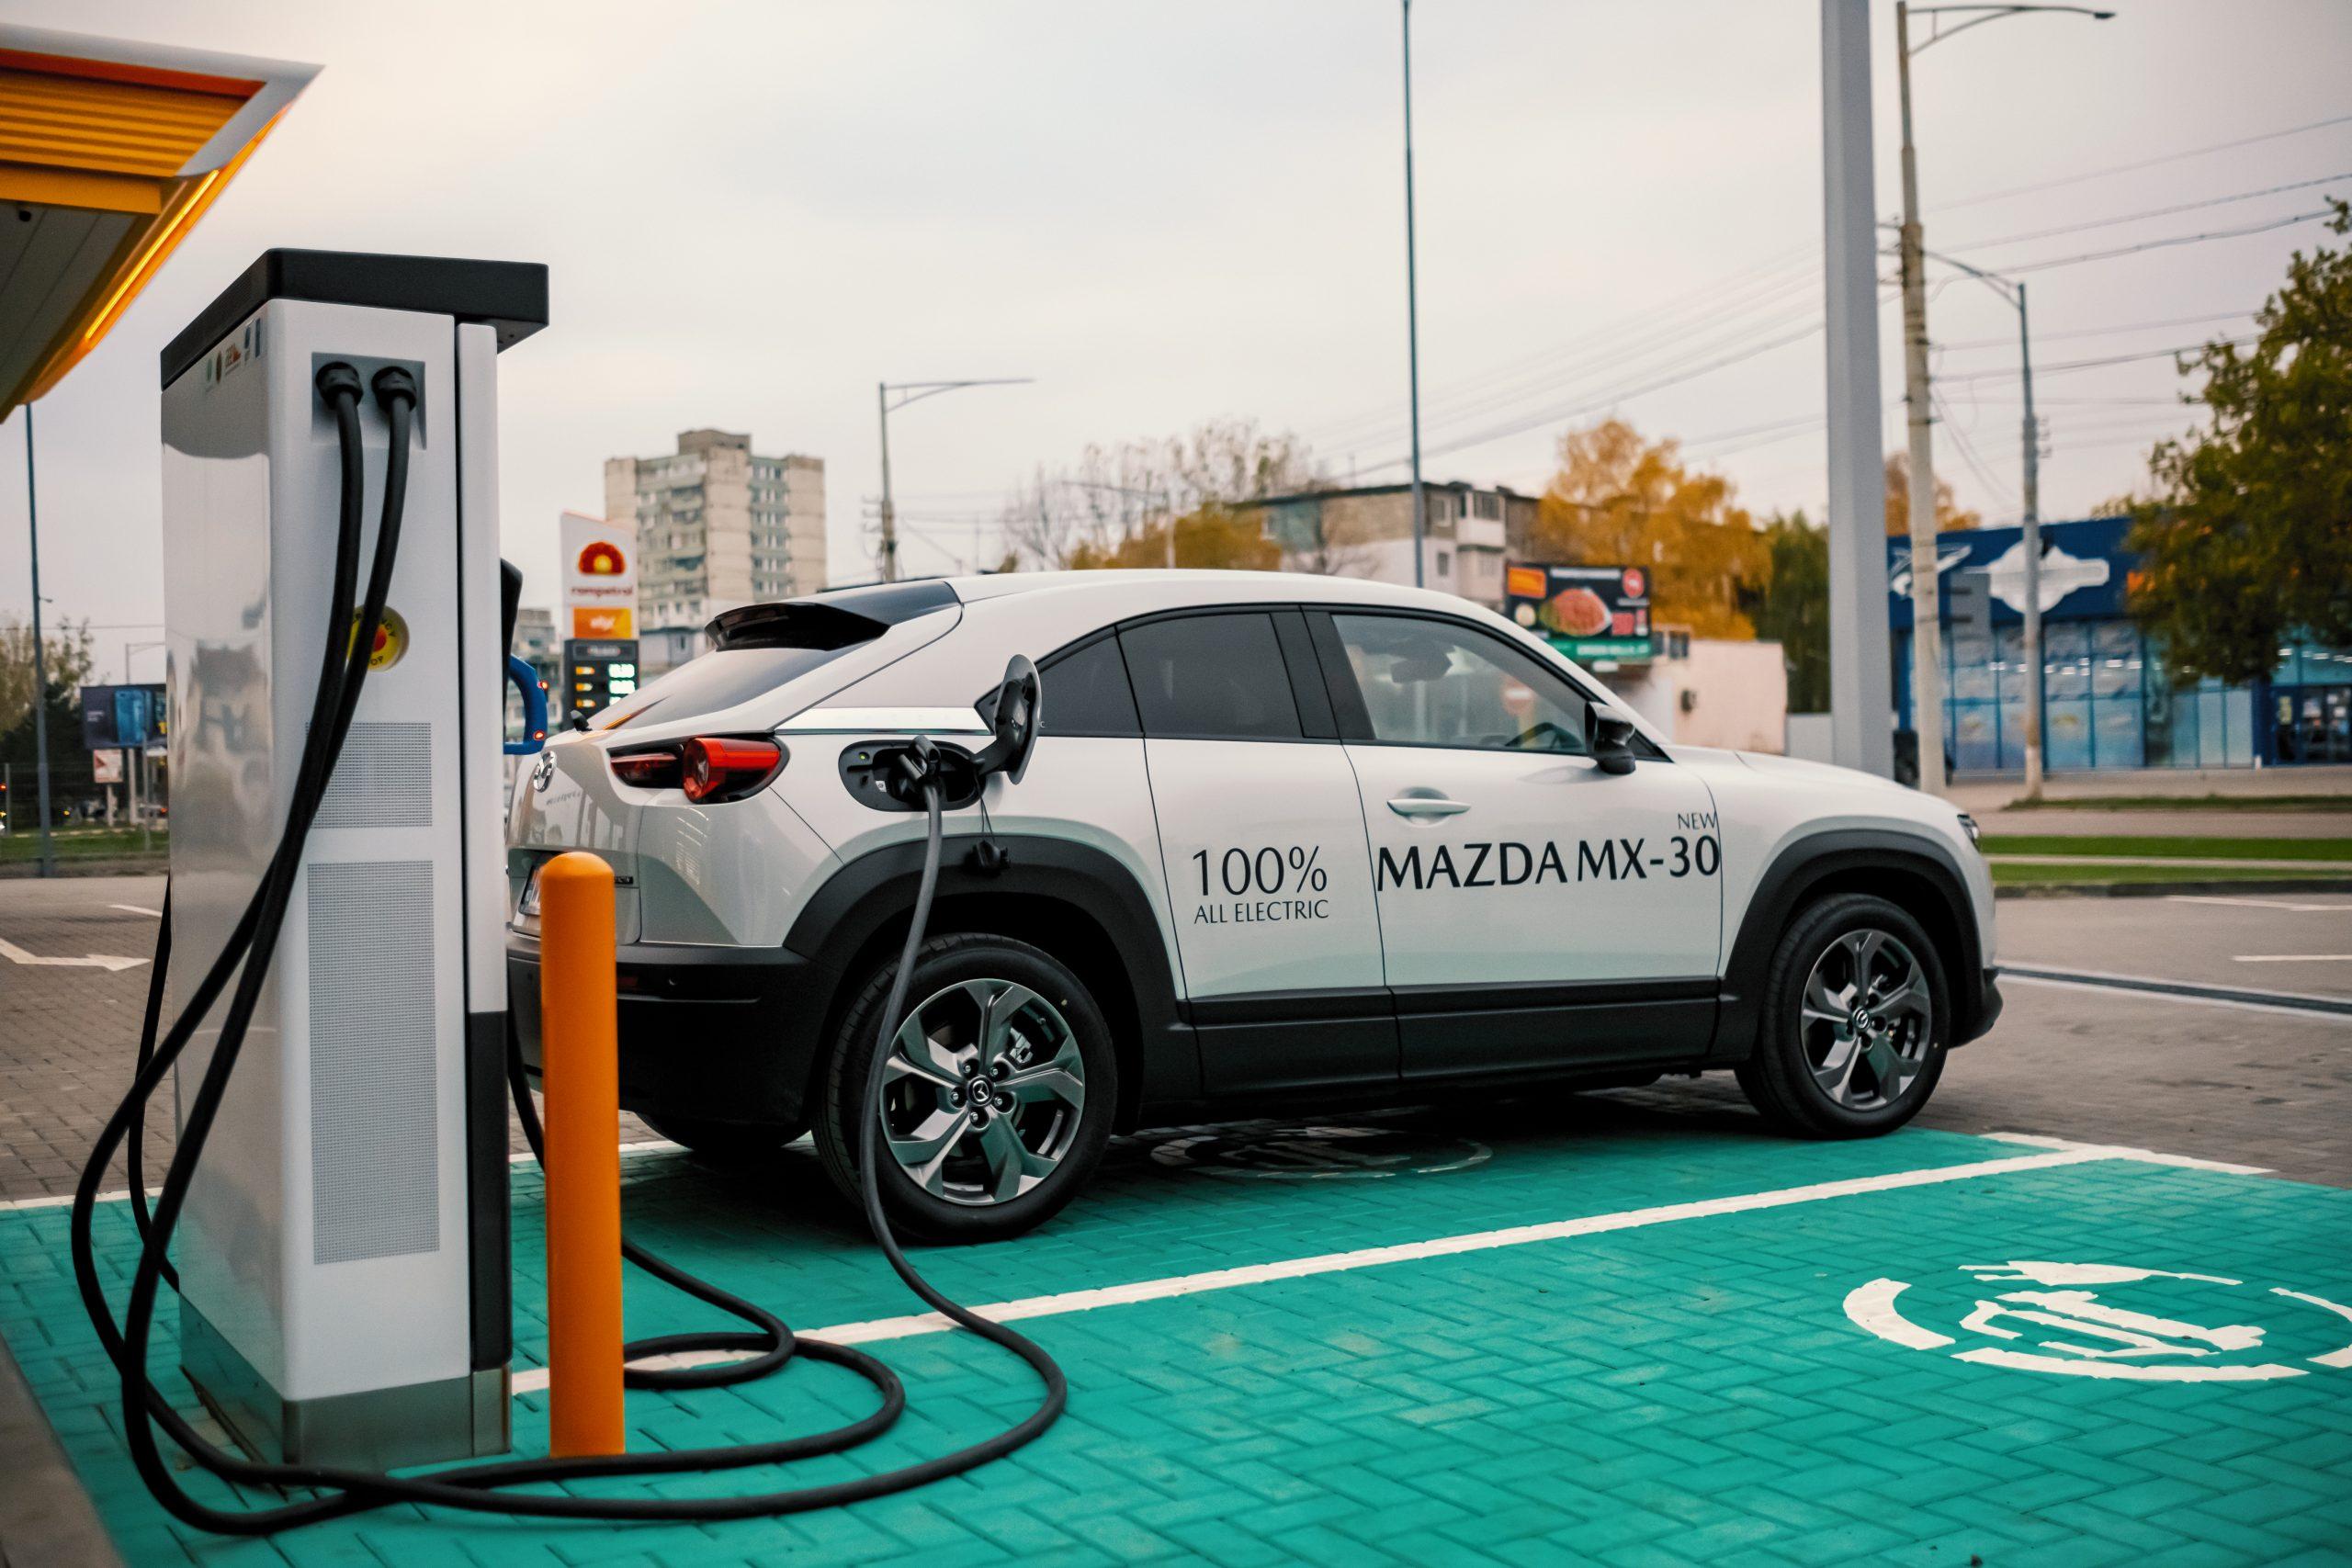 mx-30, električni automobil: